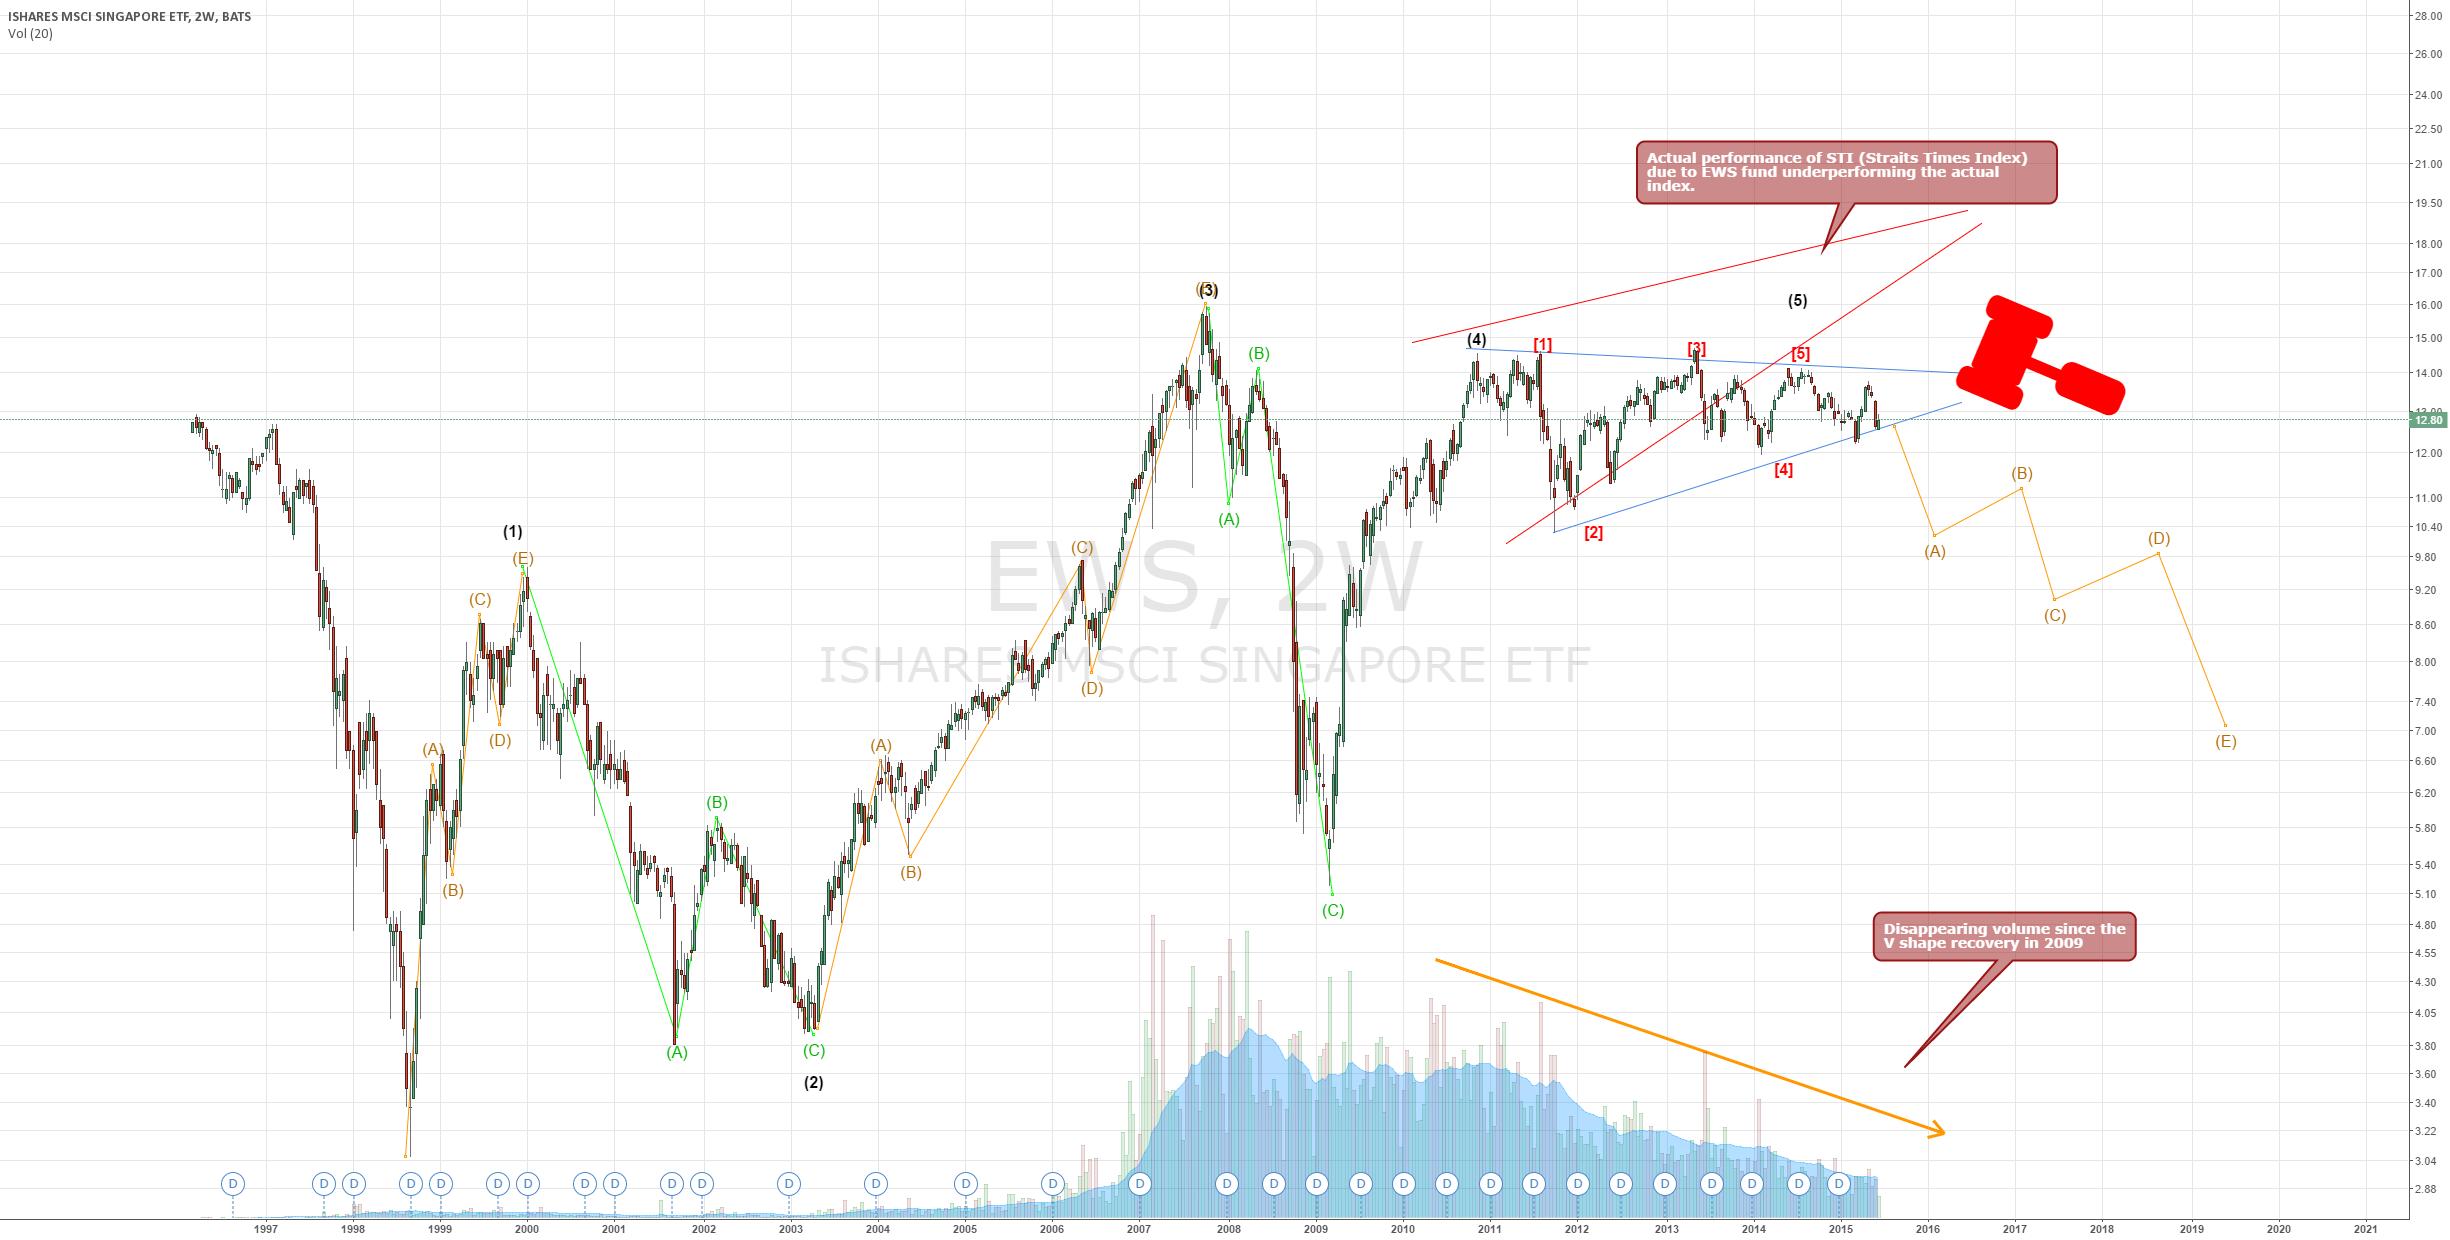 Is the STI (Singapore) close to a massive collapse?